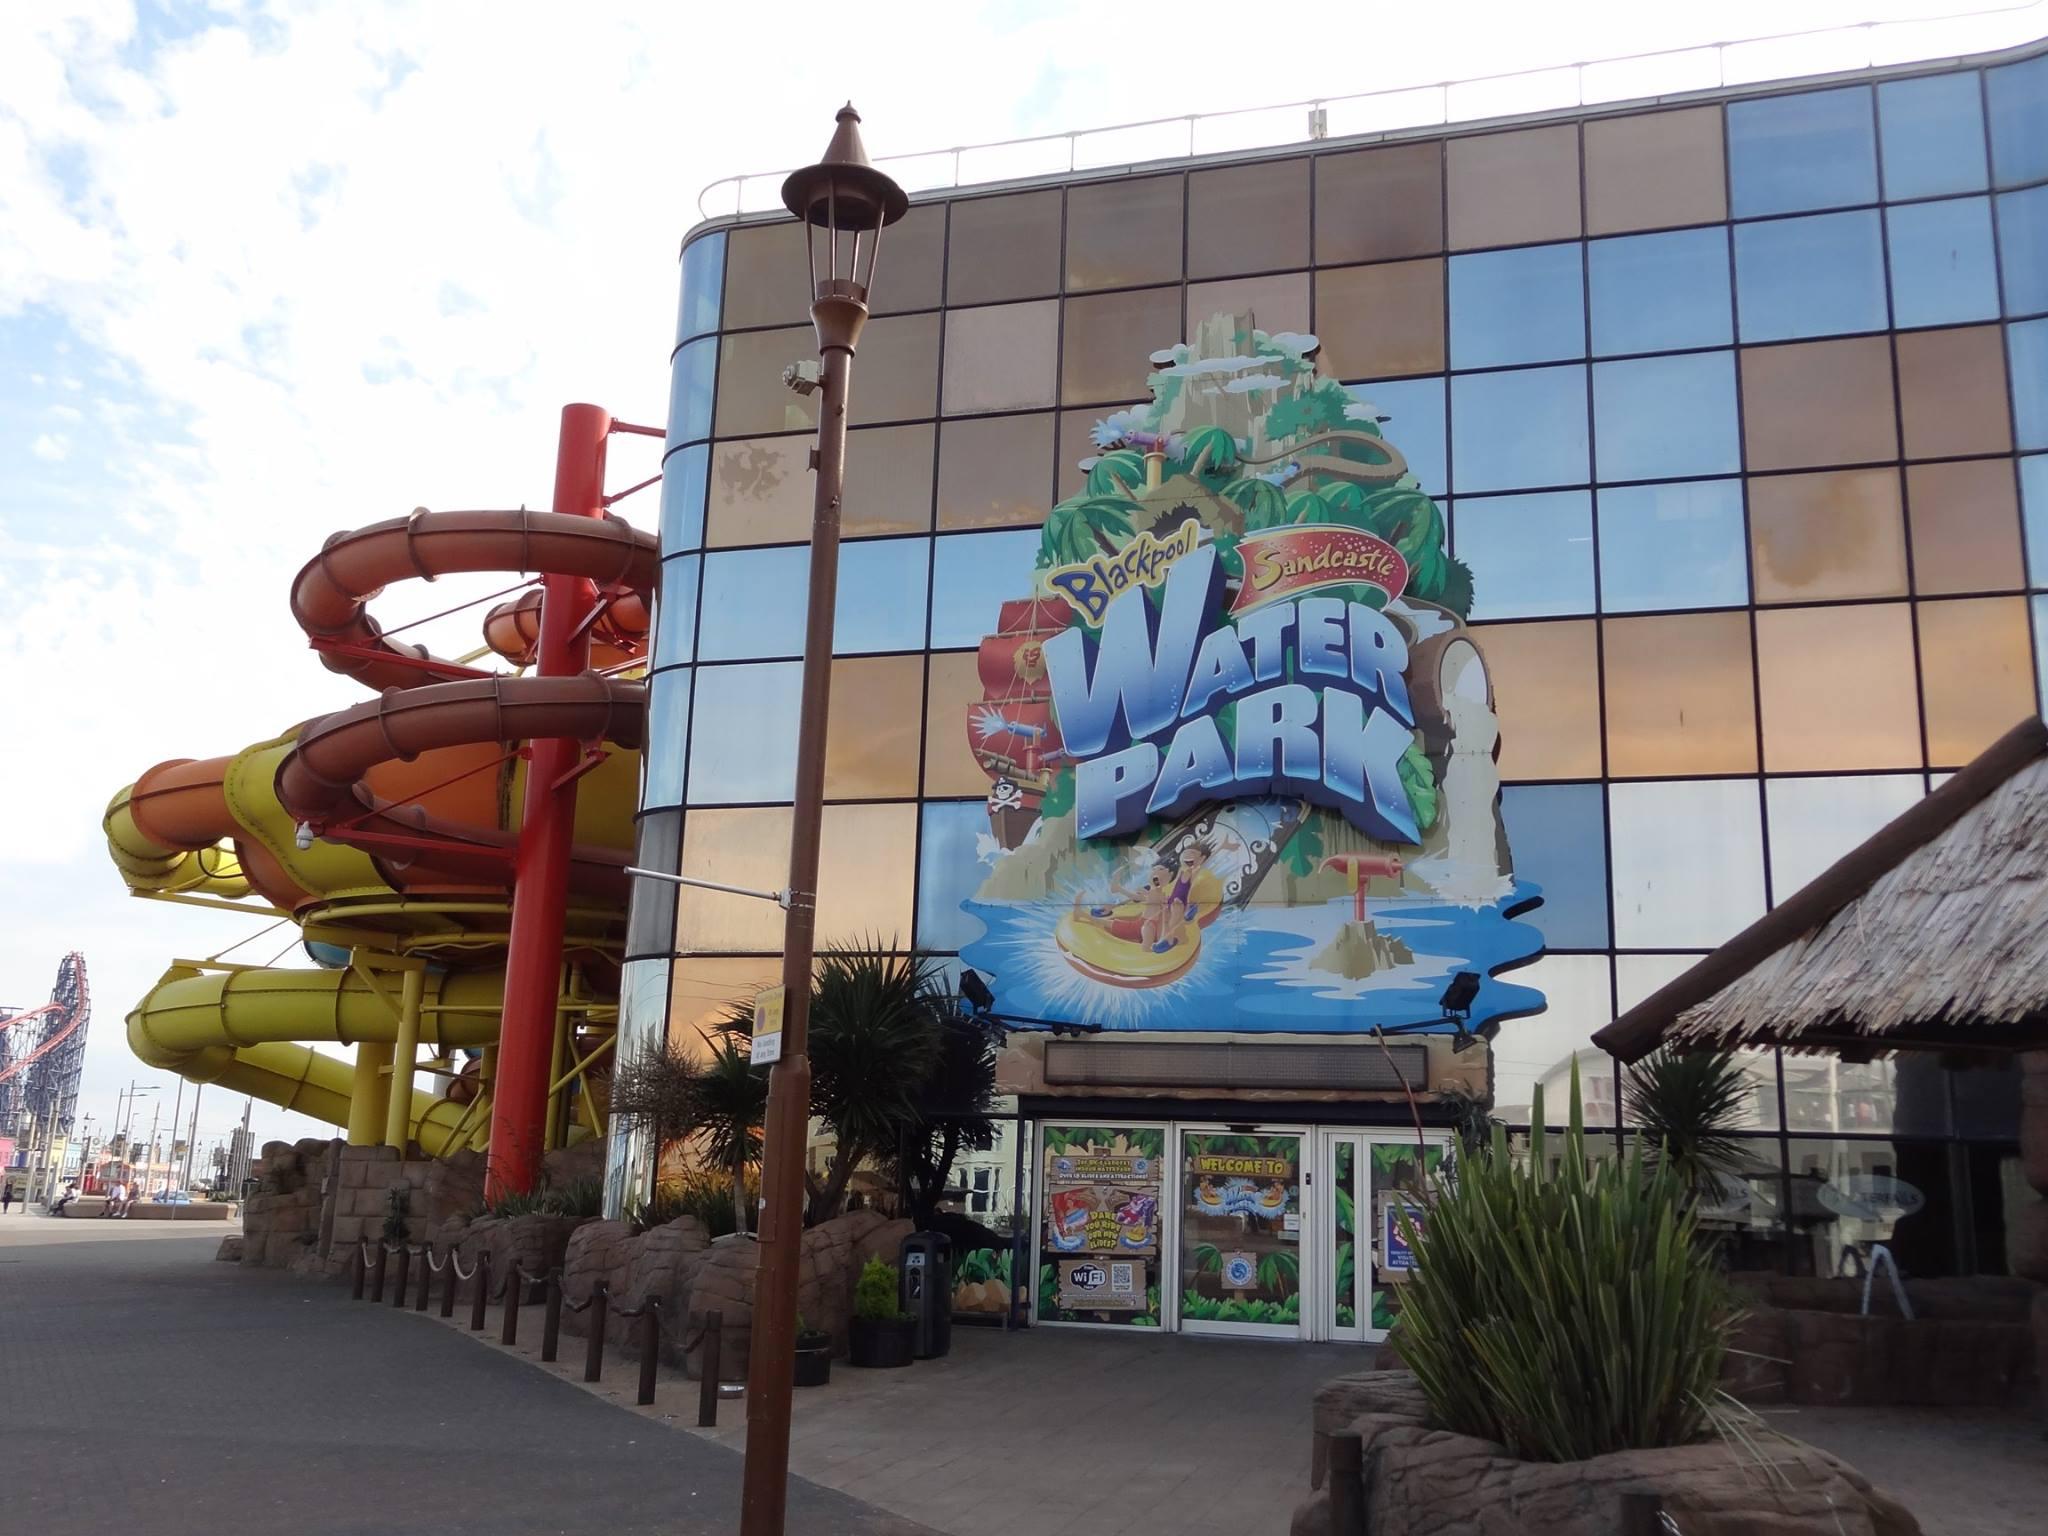 Sandcastle Waterpark Blackpool Entrance Image